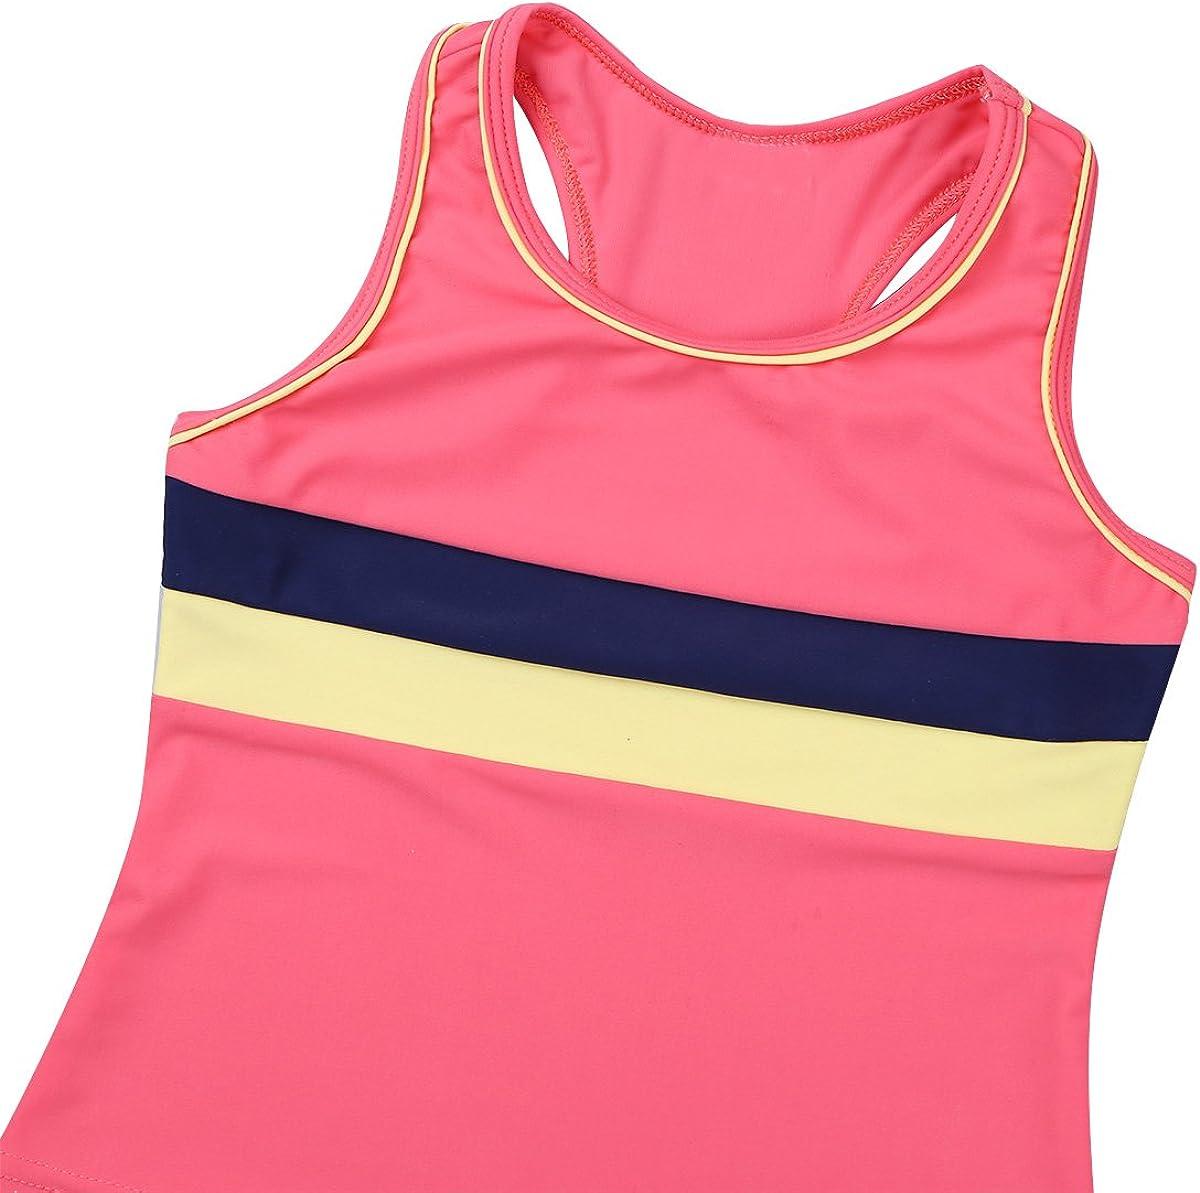 iEFiEL Boys Girls Two Piece Swimsuit Swimwear Racerback Tank Tops Vest with Shorts Bottoms Bathing Suit Swim Costumes